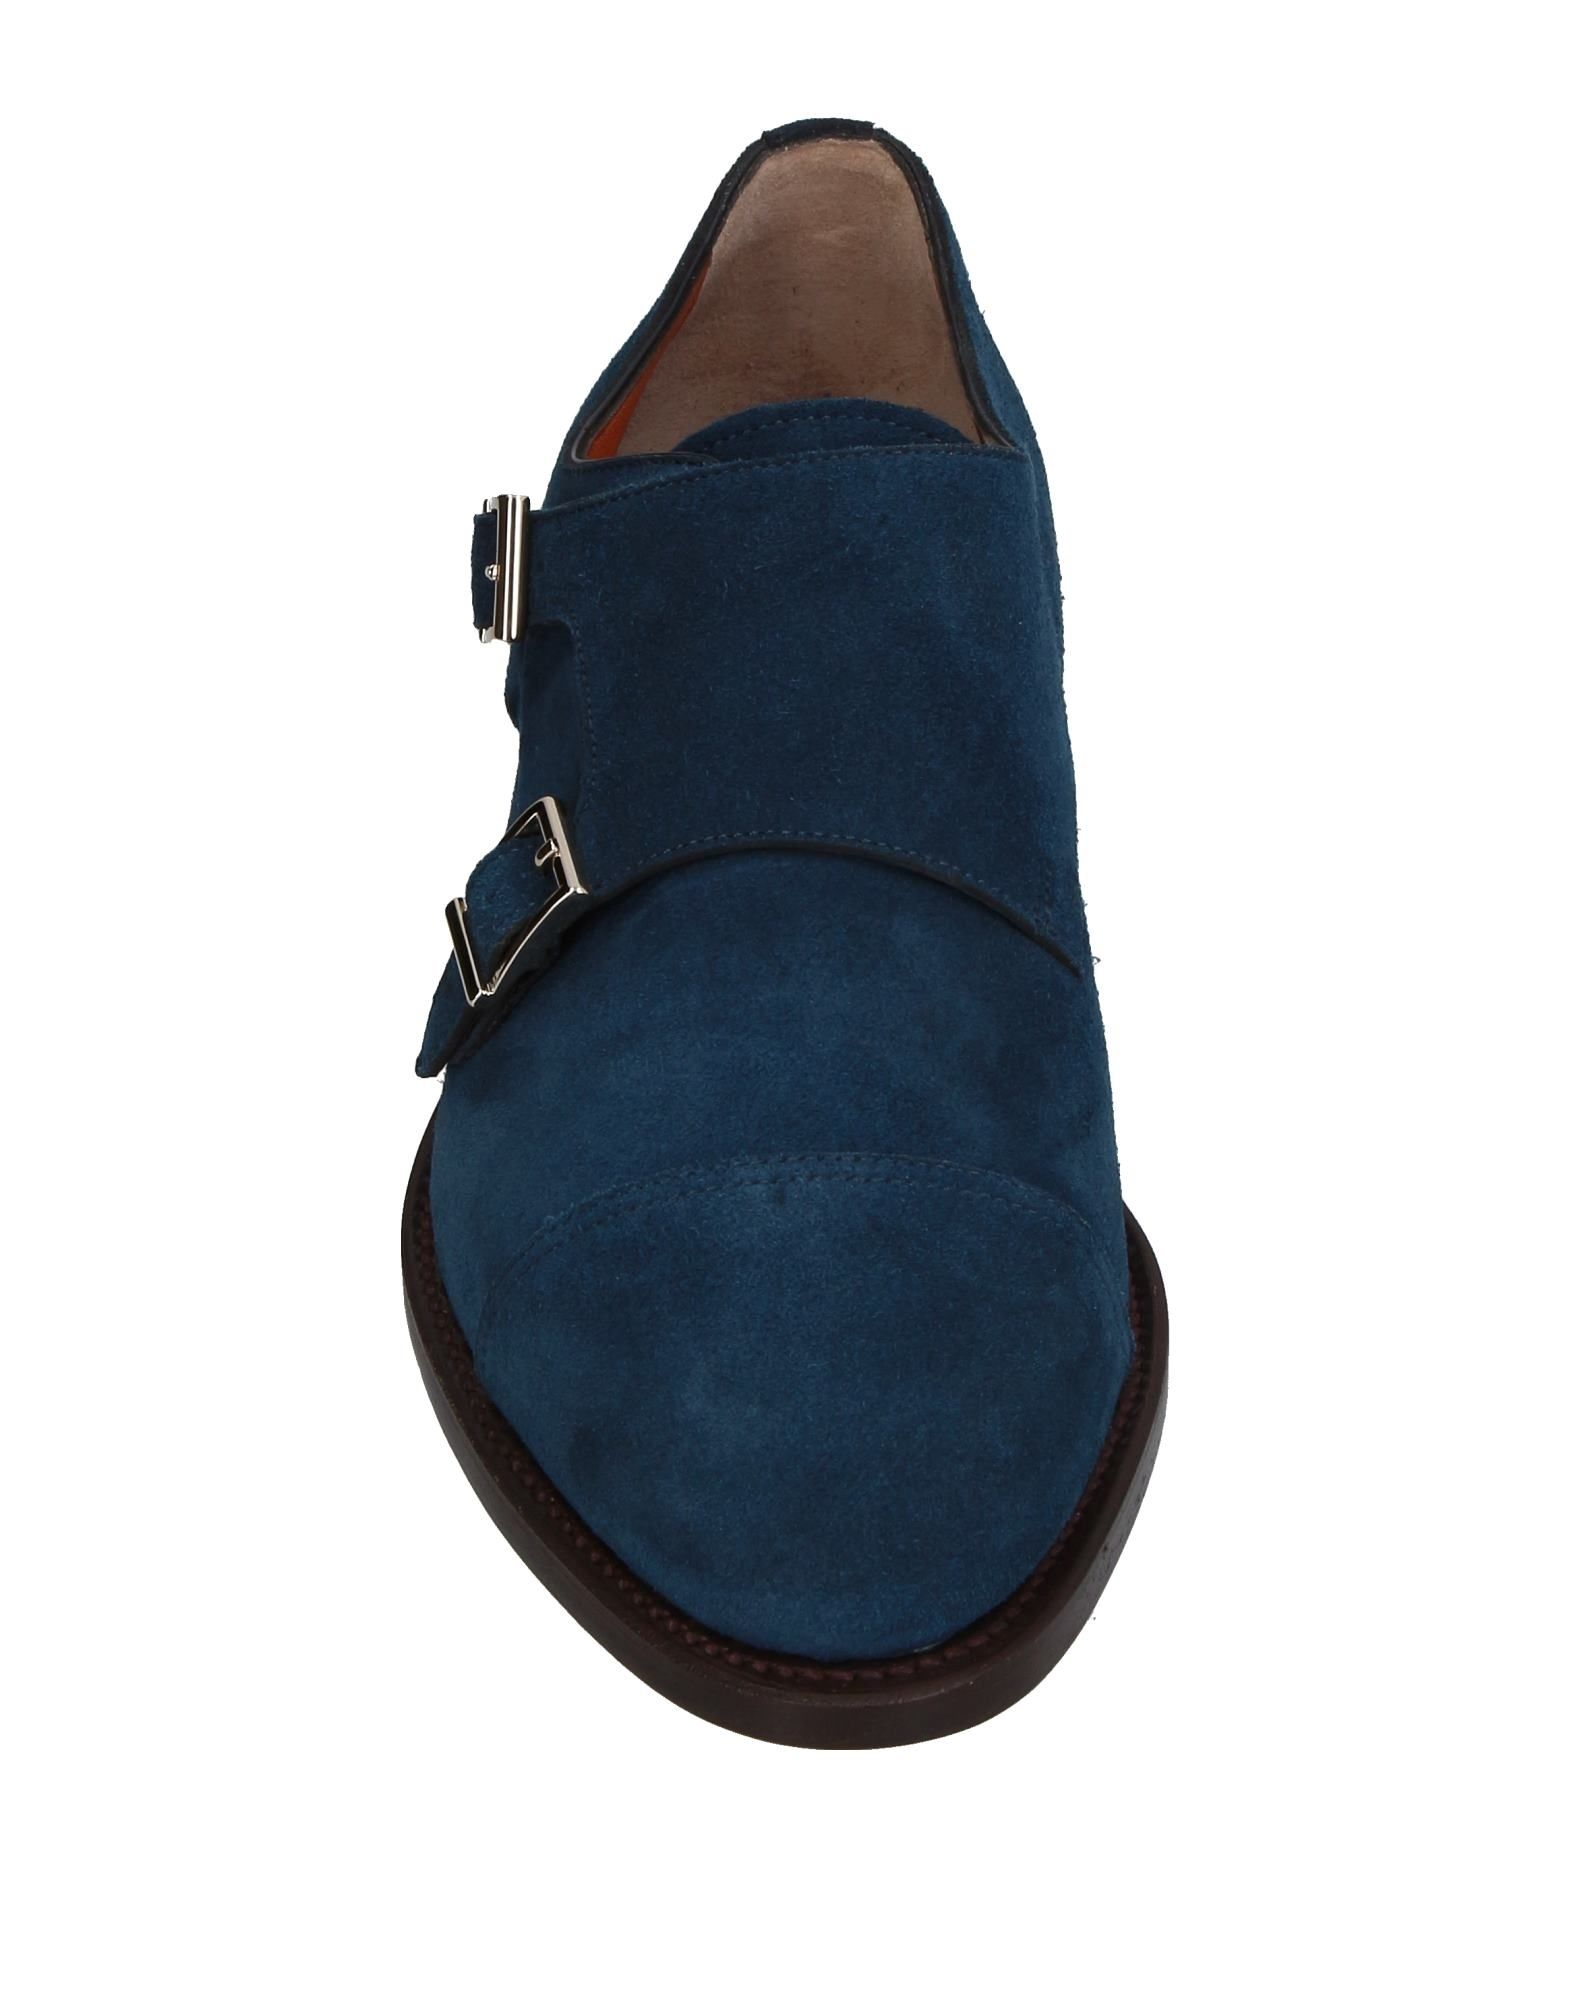 Santoni Mokassins Herren beliebte  11409608CQ Gute Qualität beliebte Herren Schuhe 2537a6